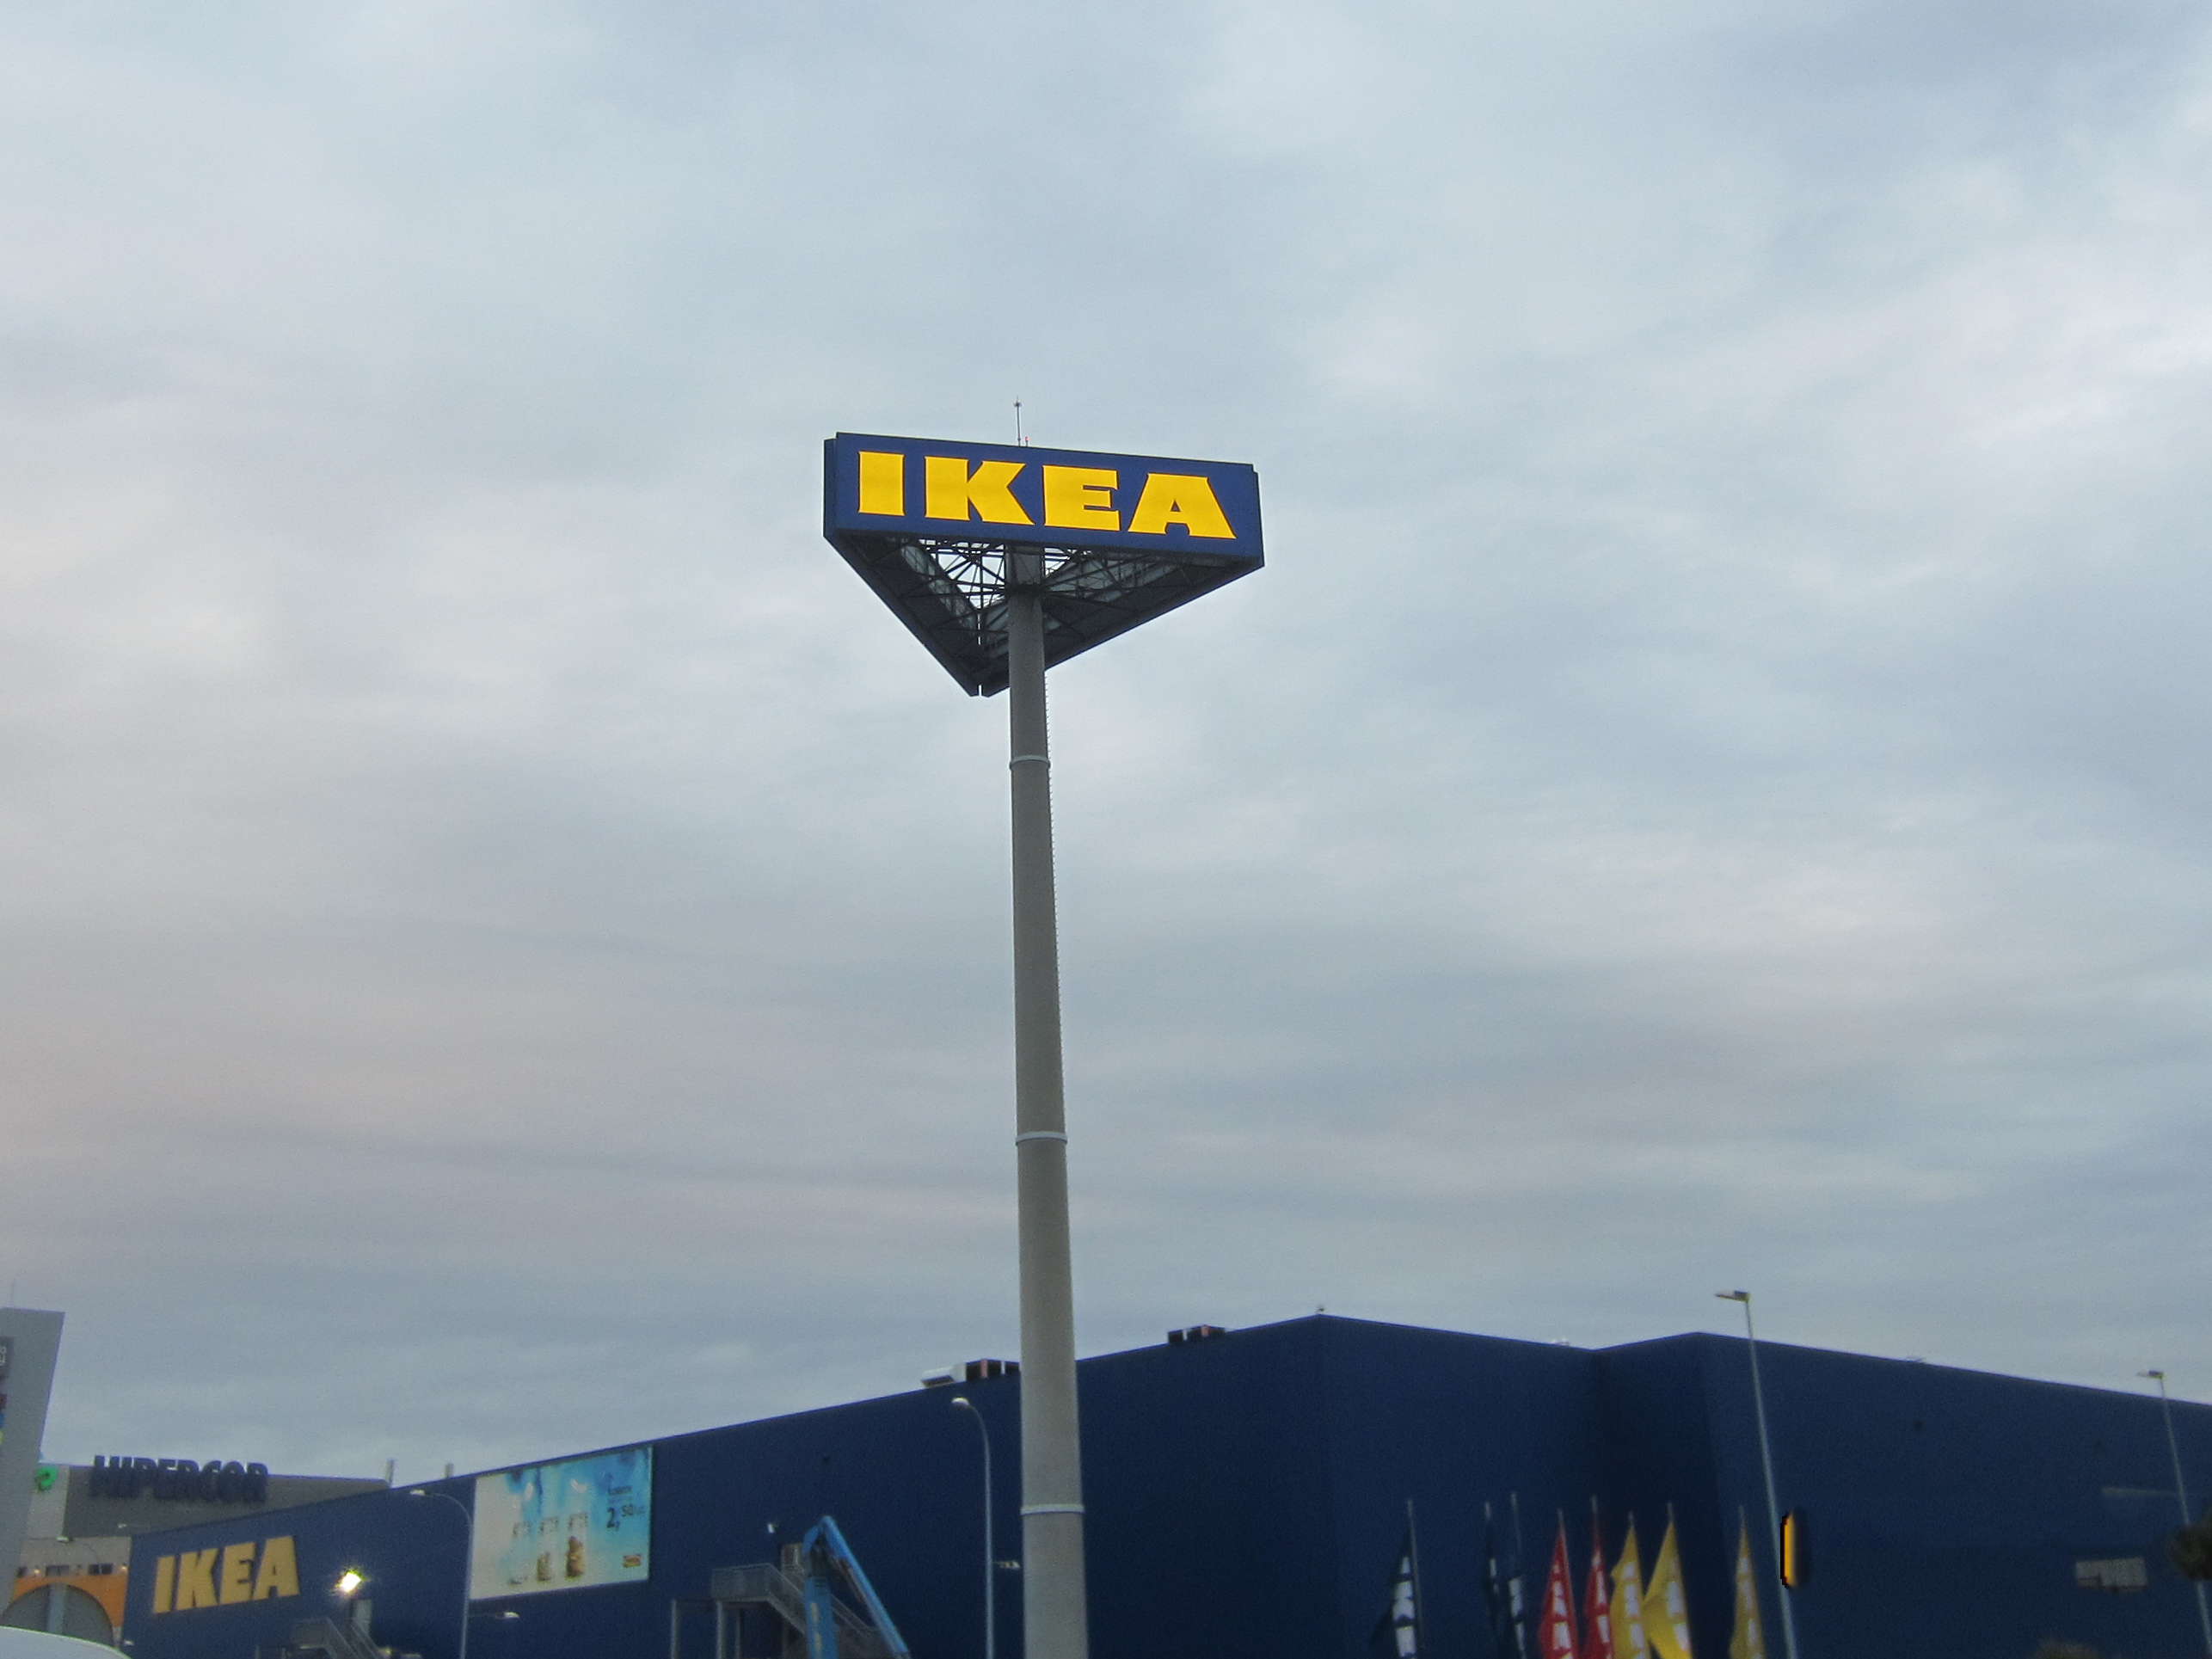 http://luzcoruna.es/wp-content/uploads/2020/03/IKEA-6.jpg